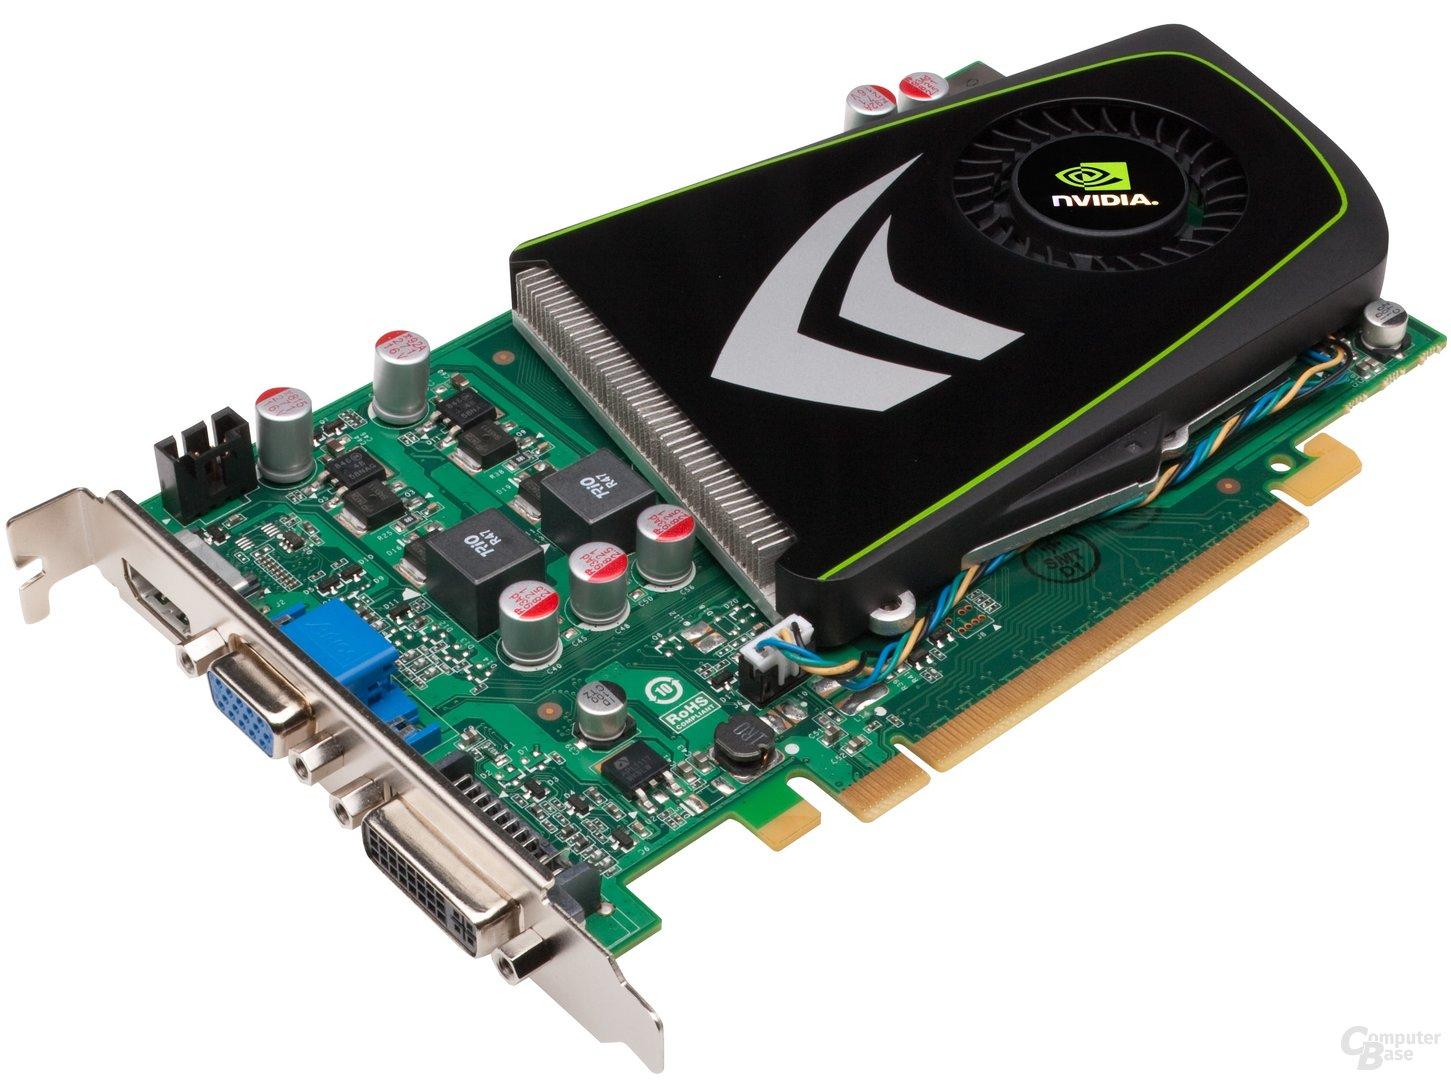 Nvidia GeForce GT 240